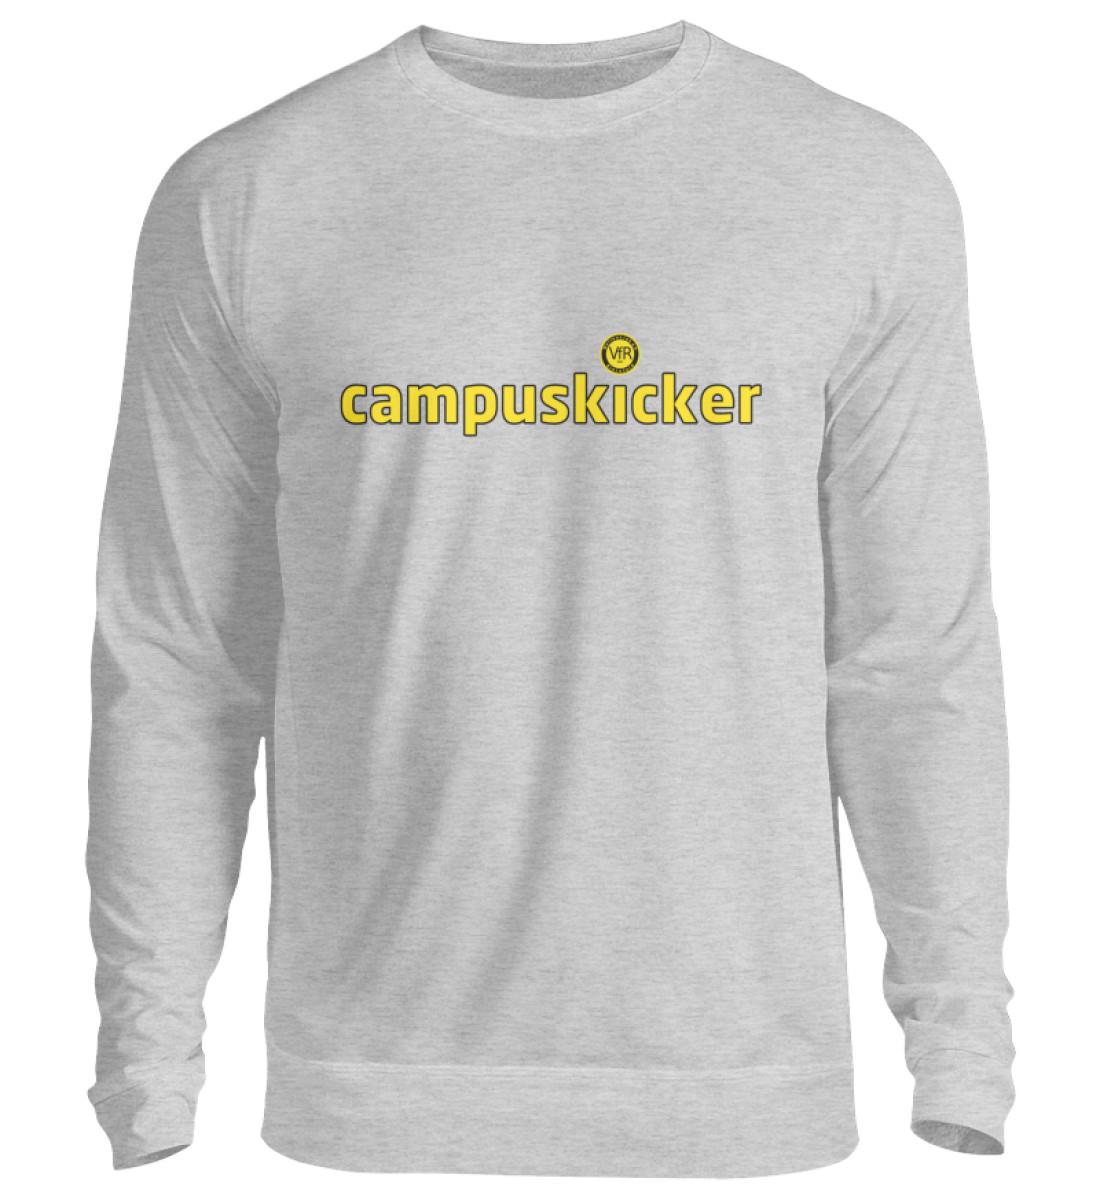 Campuskicker - Unisex Pullover-17